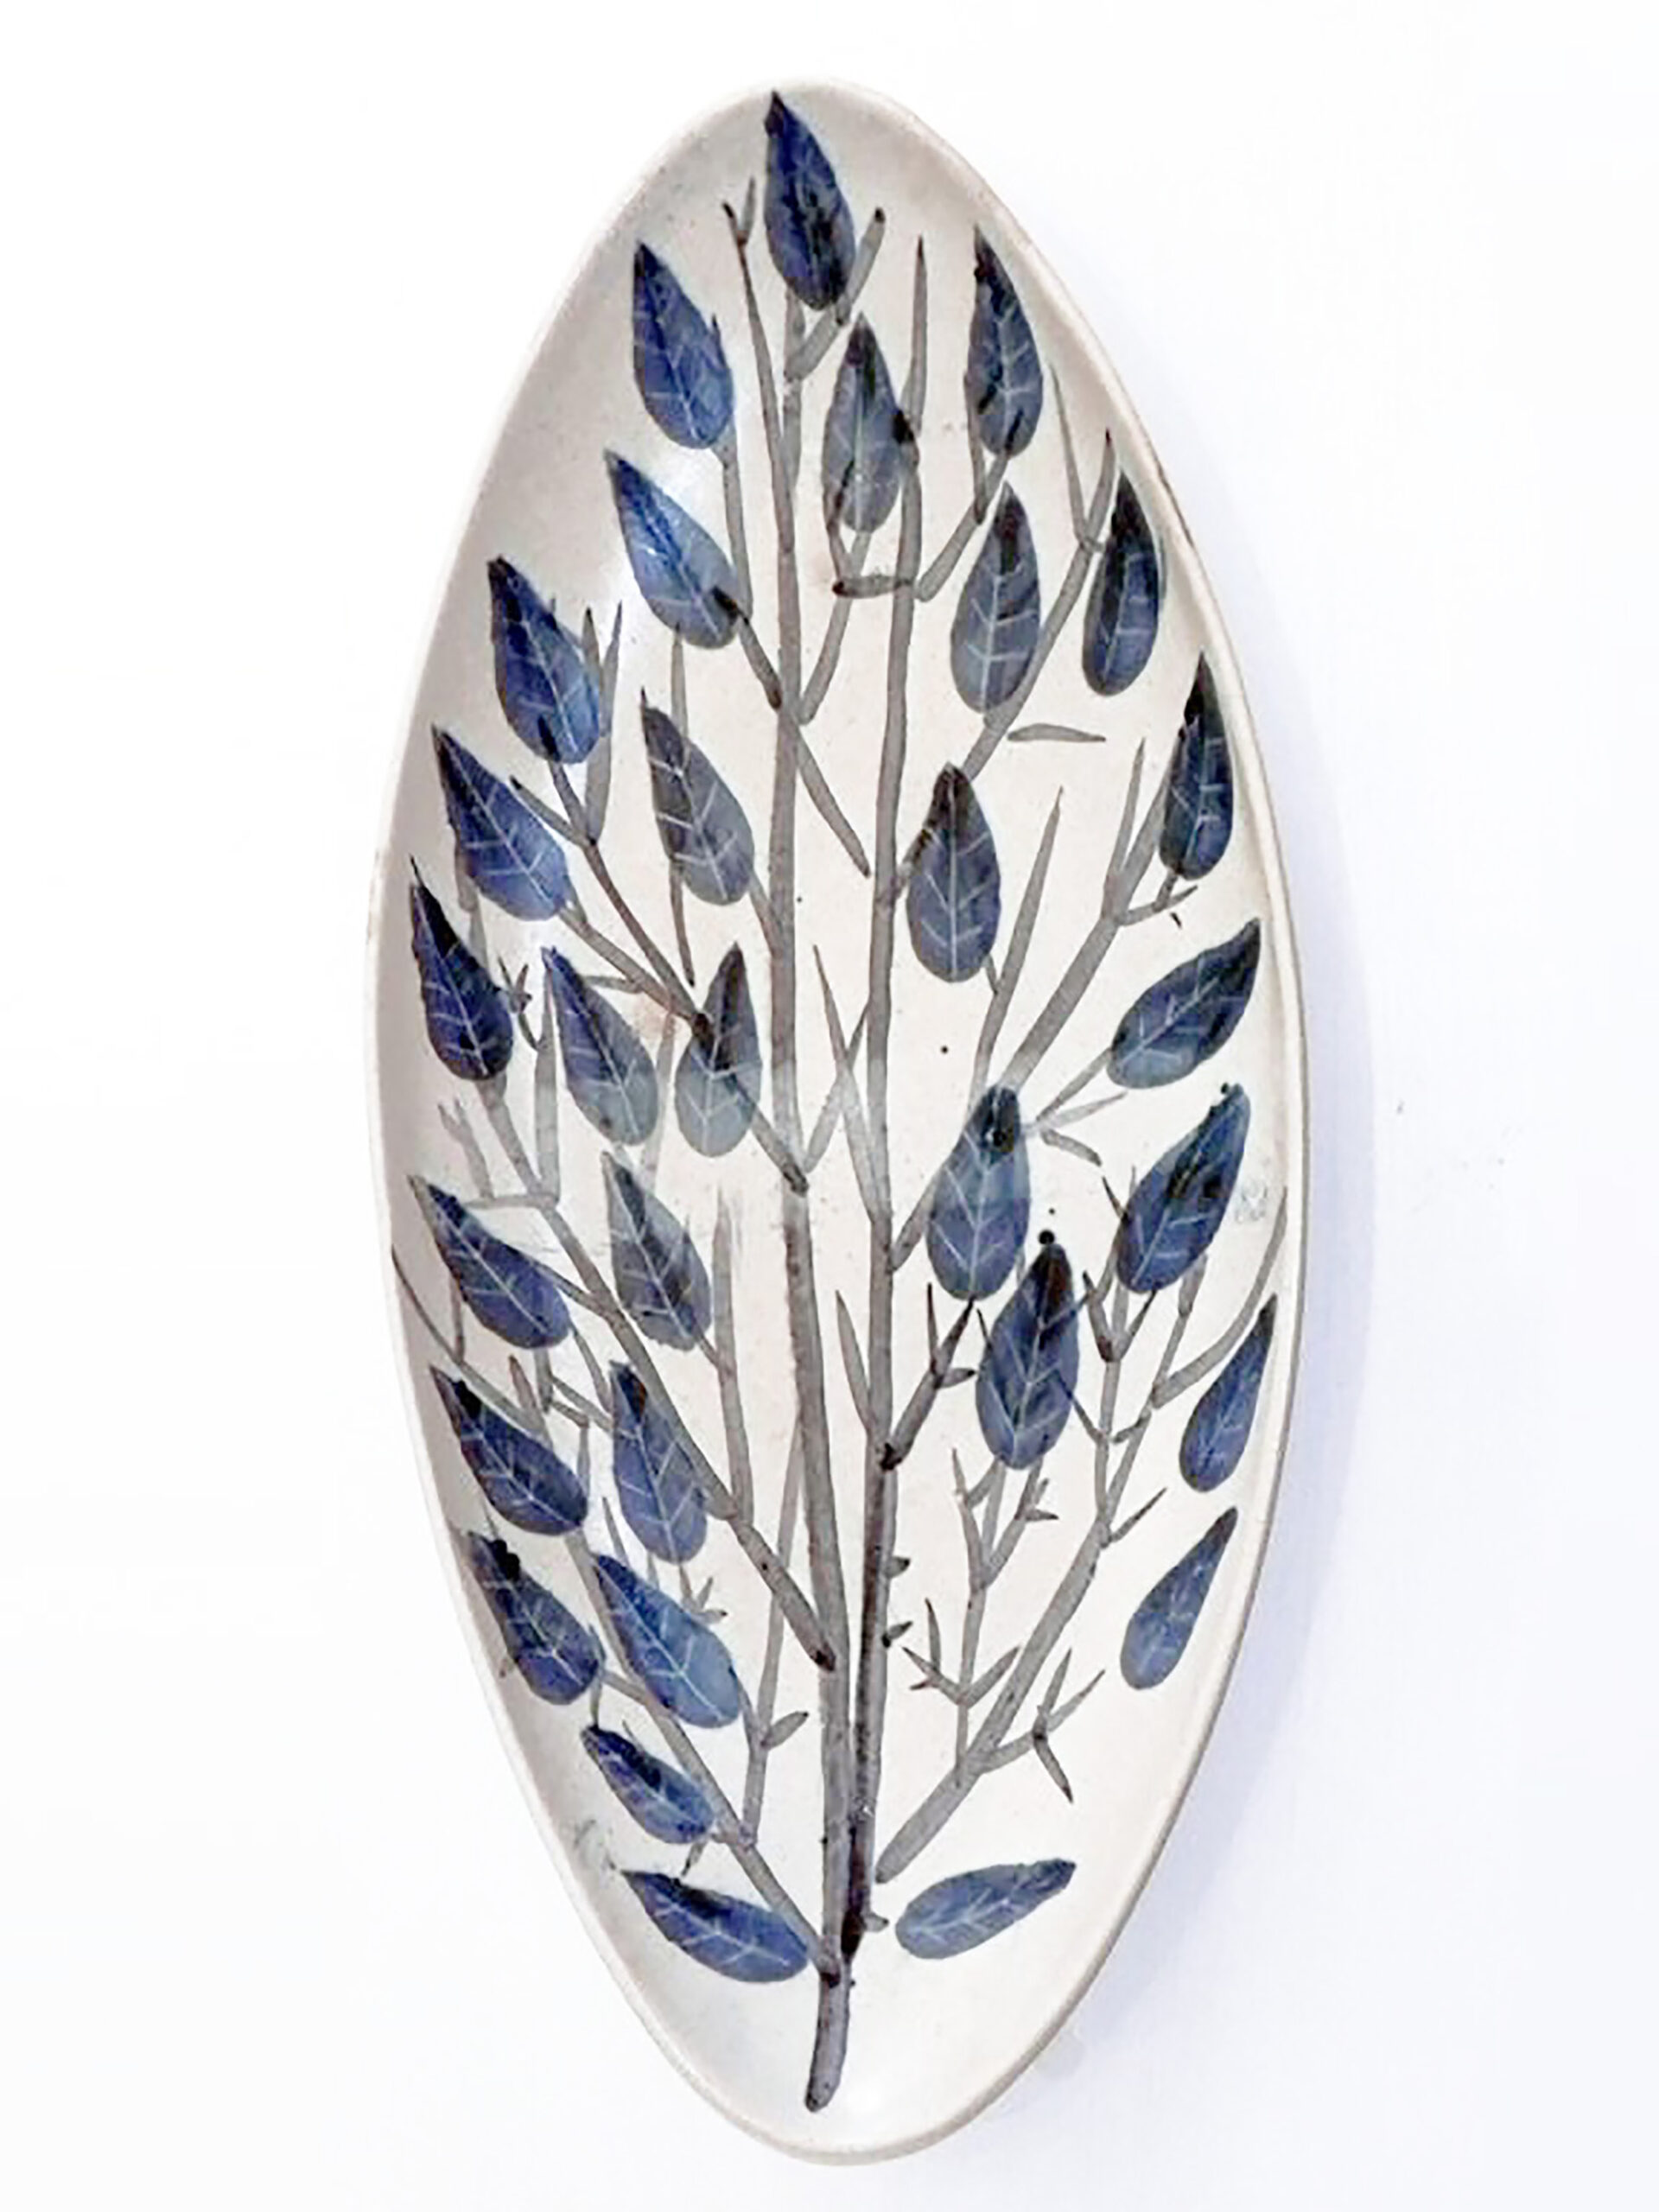 Tree-Platter-Blue-Leaf-1-of-1-6-768x576